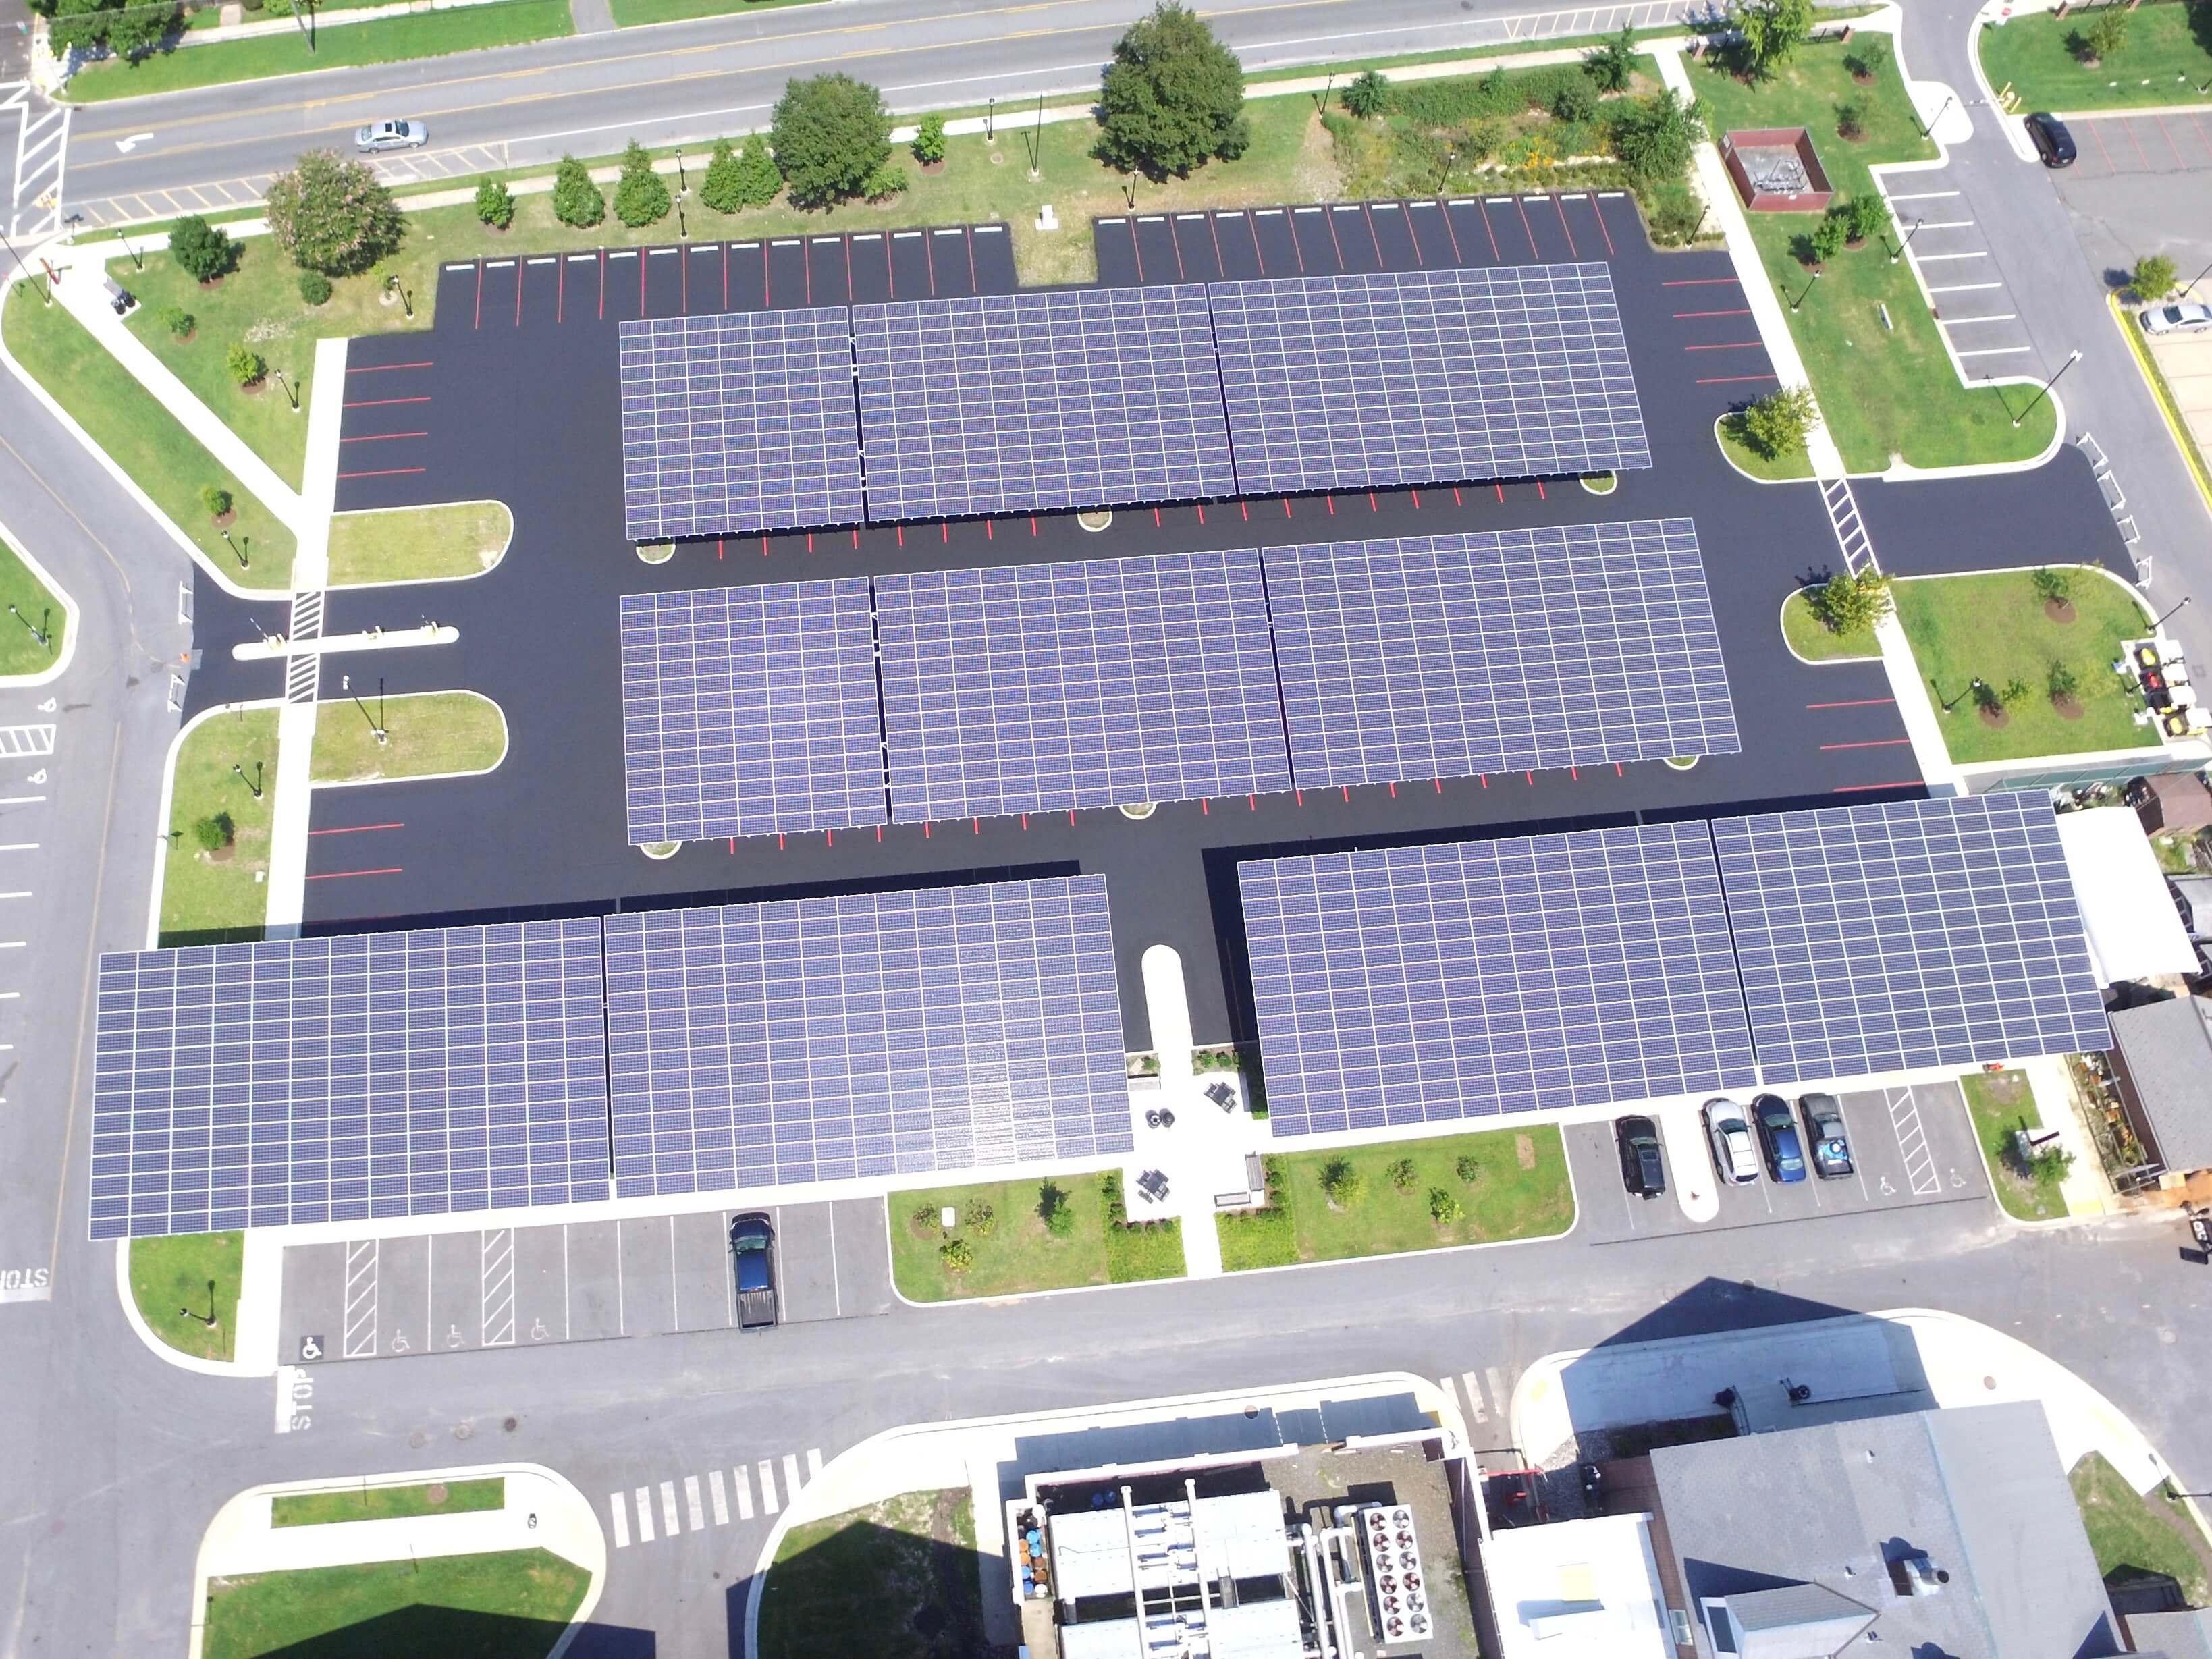 Maryland-based ... & Salisbury University Completes Solar Canopy Project - Solar Industry